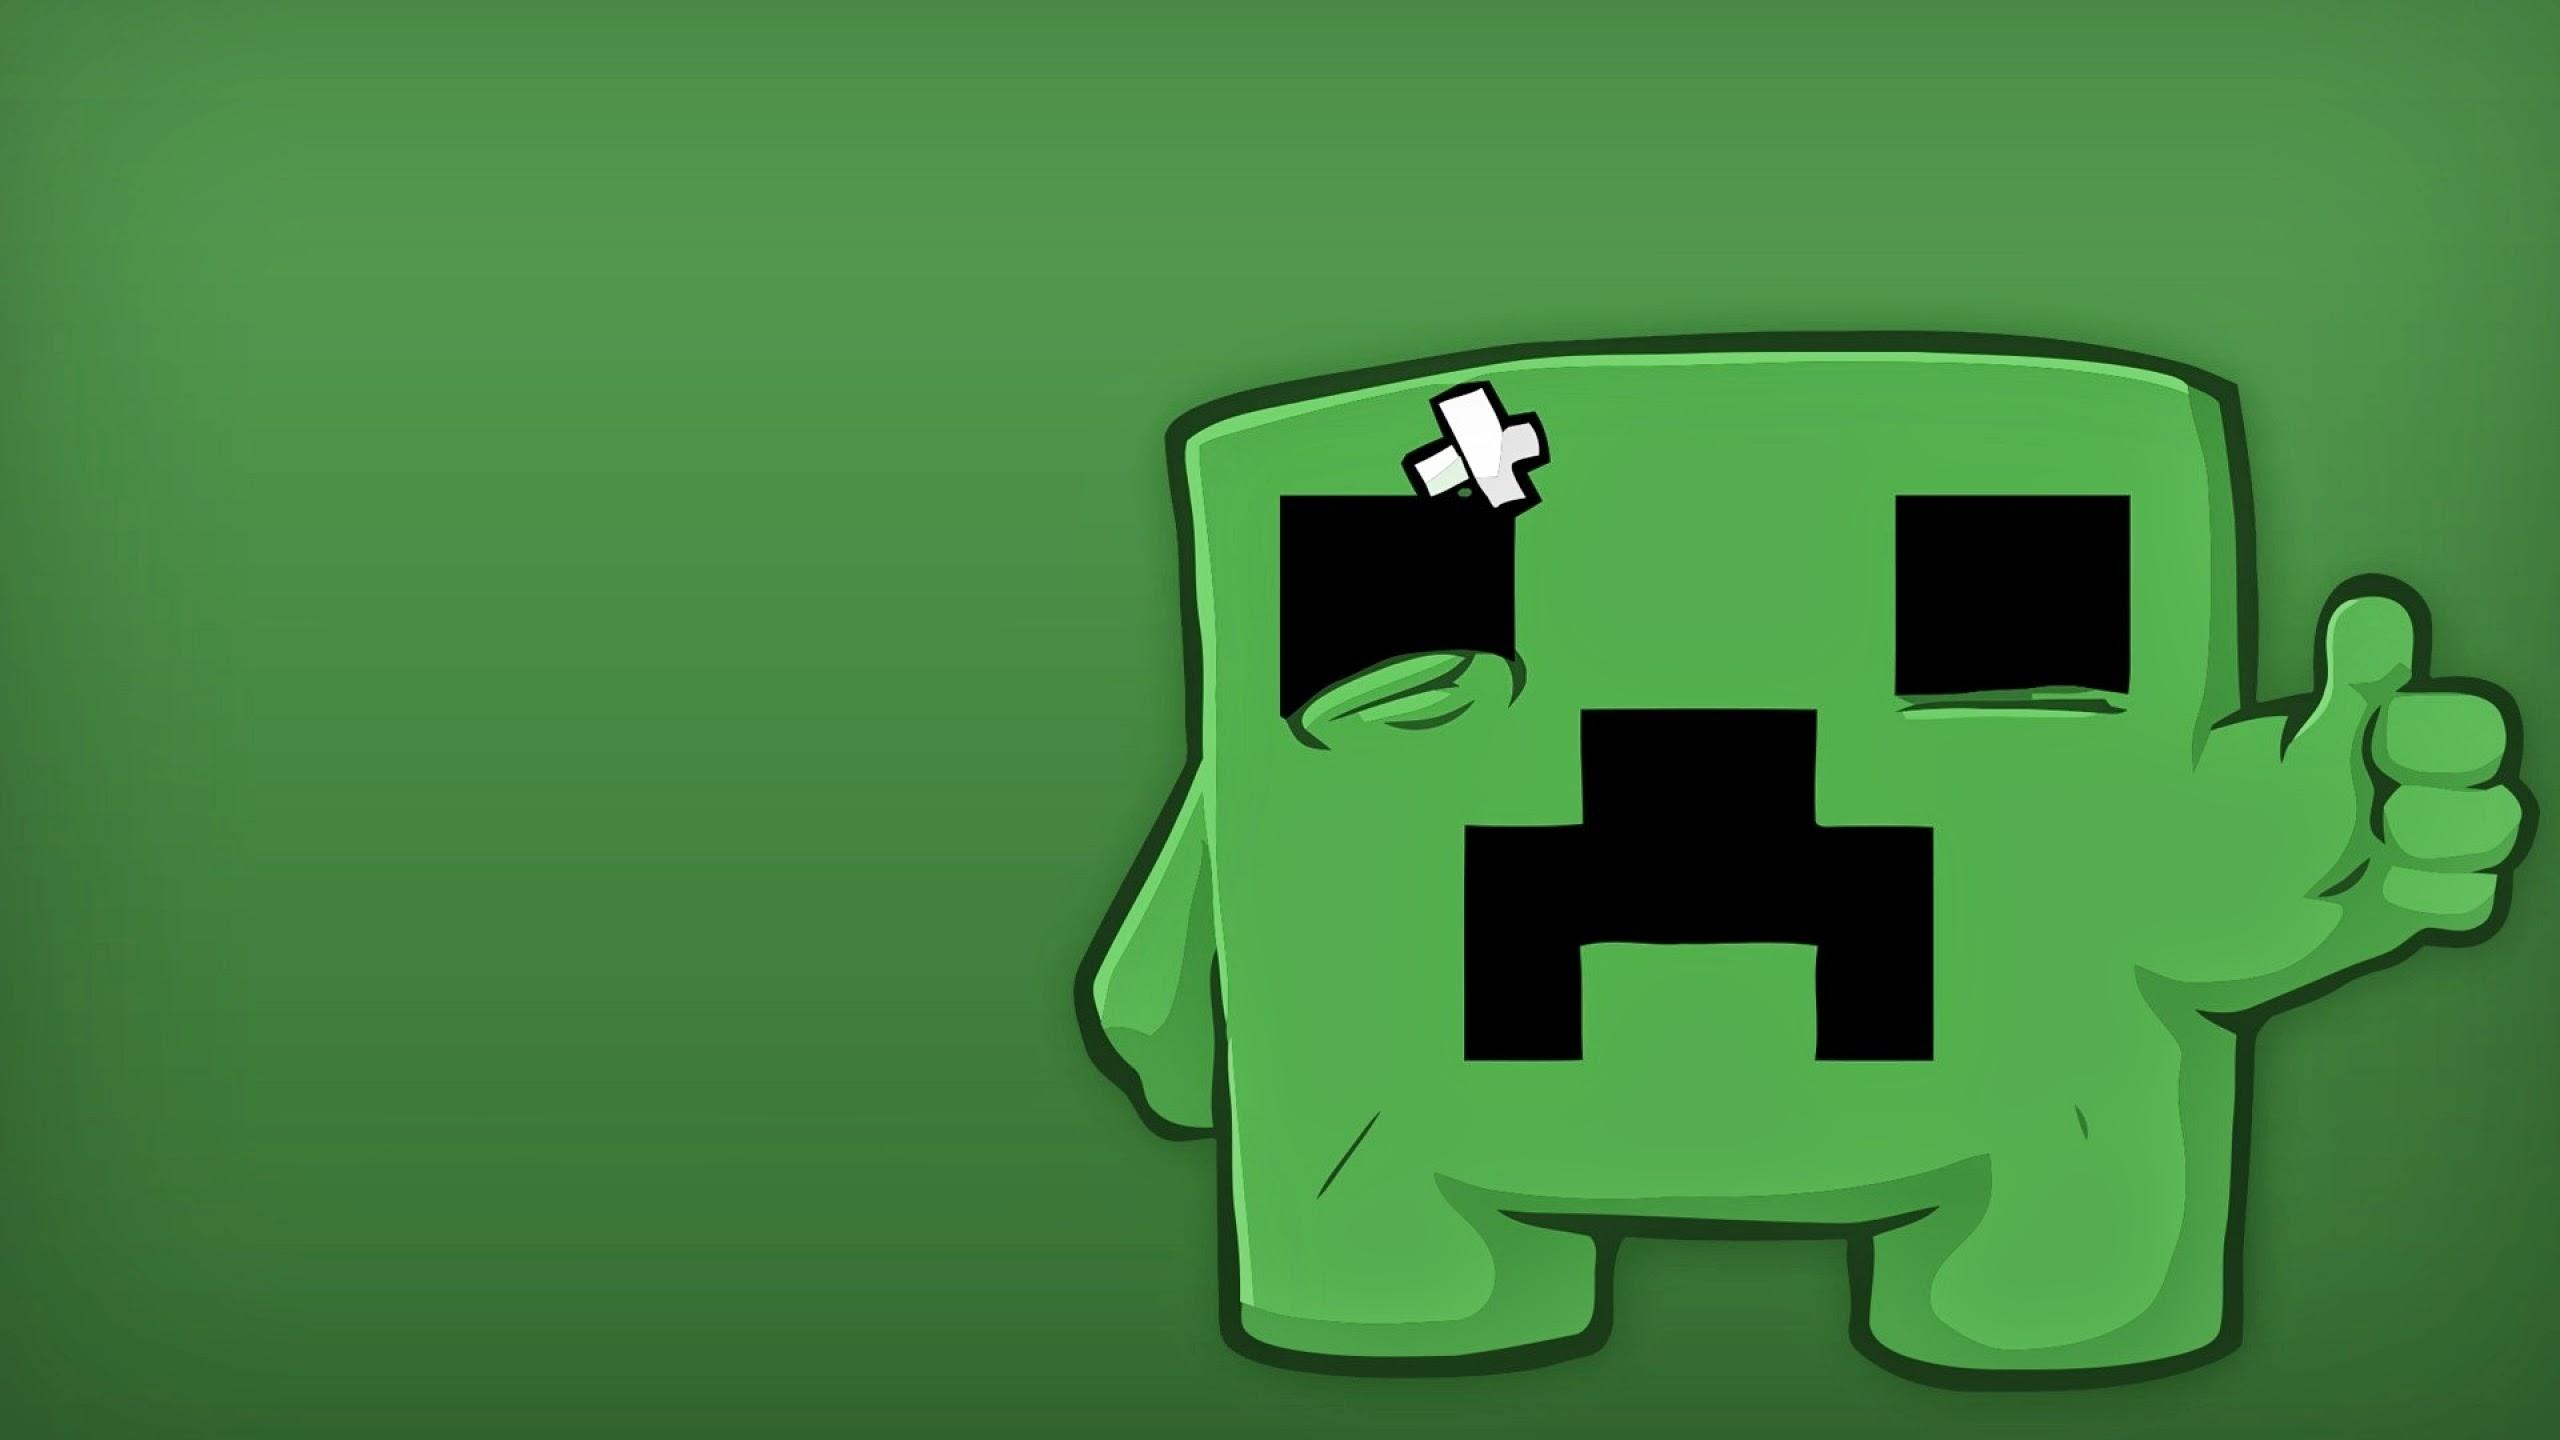 Minecraft Youtube 2560x1440 Minimalistic creeper minecraft 2560x1440